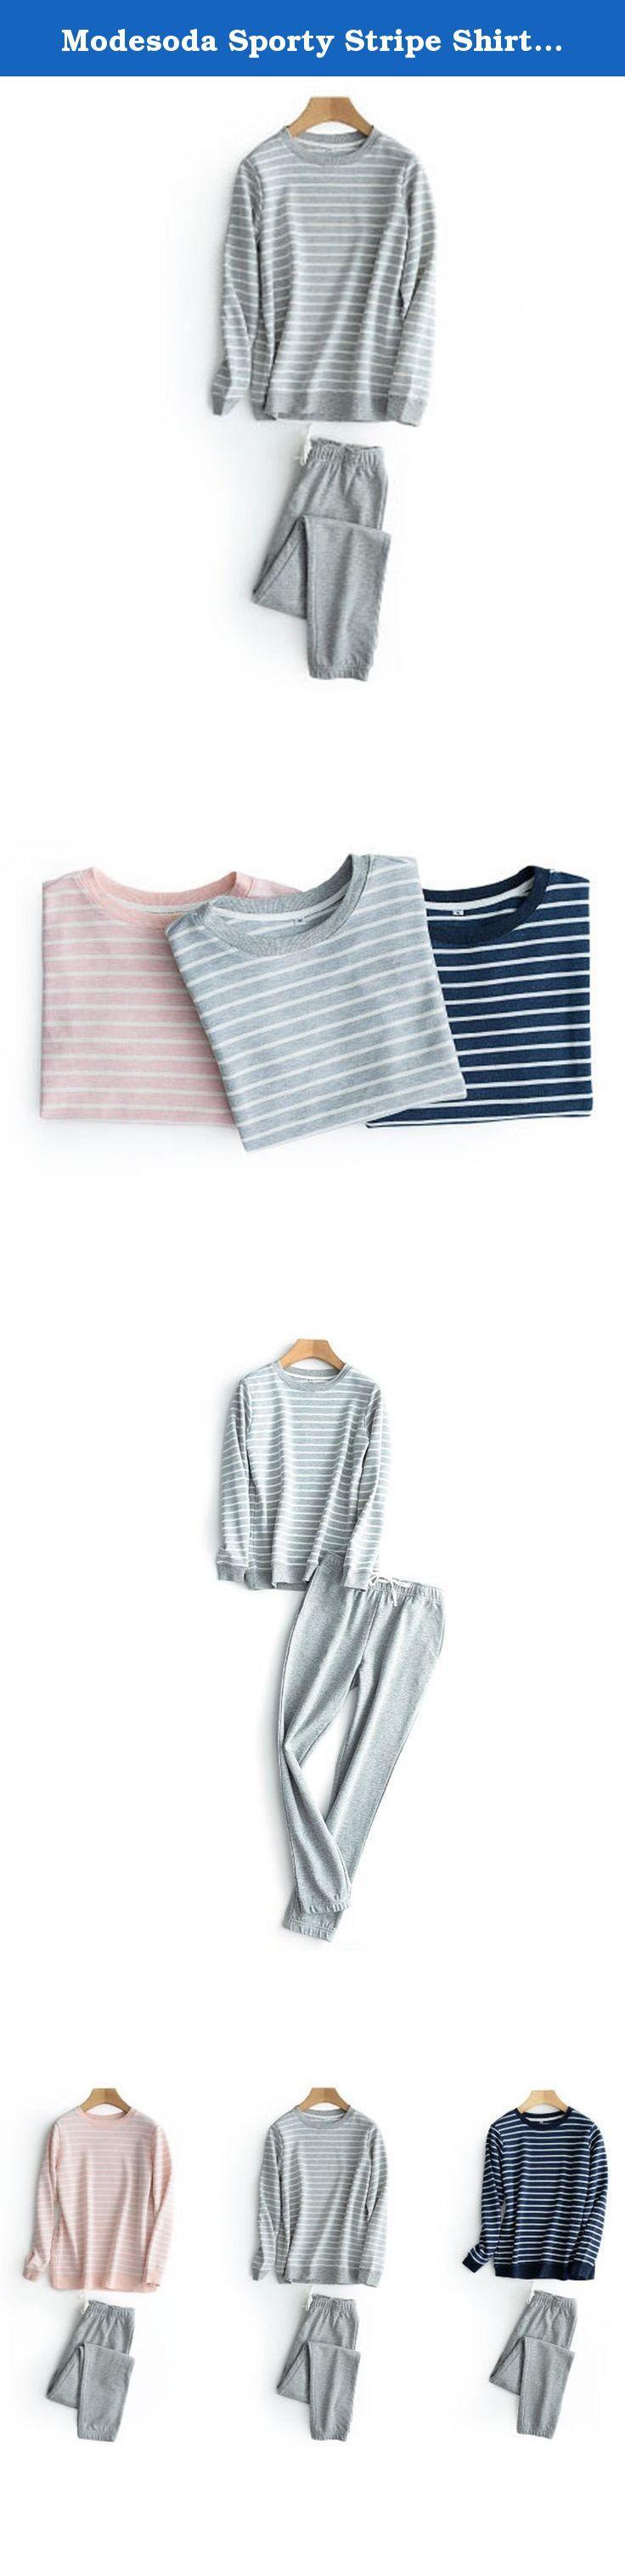 "Modesoda Sporty Stripe Shirt Jogger Pajamas Set Nightdress. Size Chart for Women: S: bust 37"",waist 26-36"",hip 43"",top length 24"",pants length 36"" M: bust 39"",waist 27-37"",hip 43"",top length 24"",pants length 37"" Size Chart for Men: S: bust 41"",waist 28-37"",hip 43"",top length 26"",pants length 38"" M: bust 42"",waist 29-39"",hip 45"",top length 26"",pants length 40""."